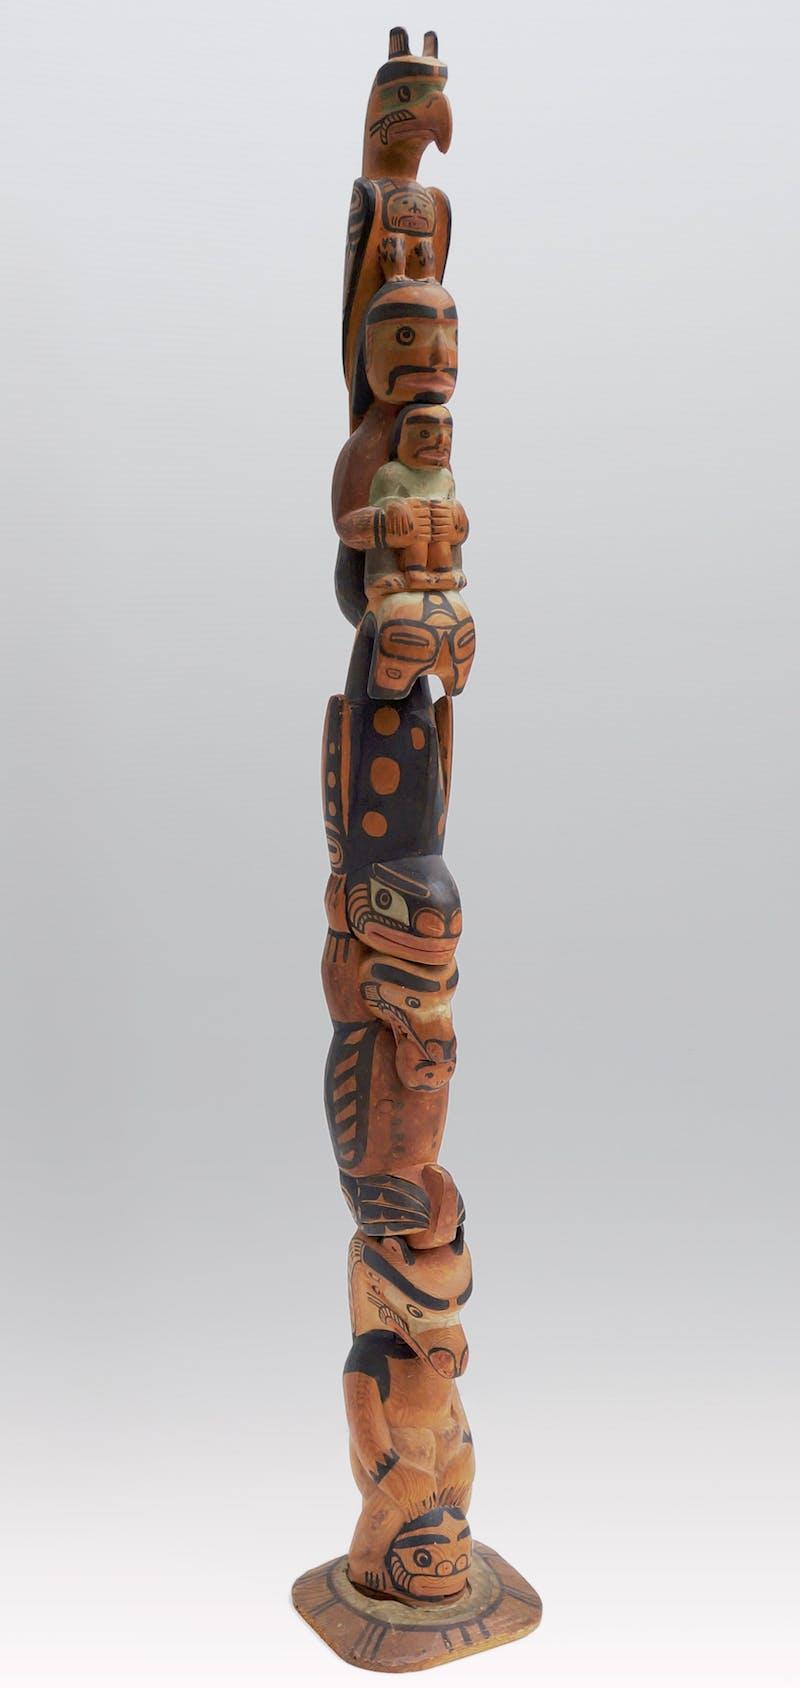 Model Totem Pole Image 3